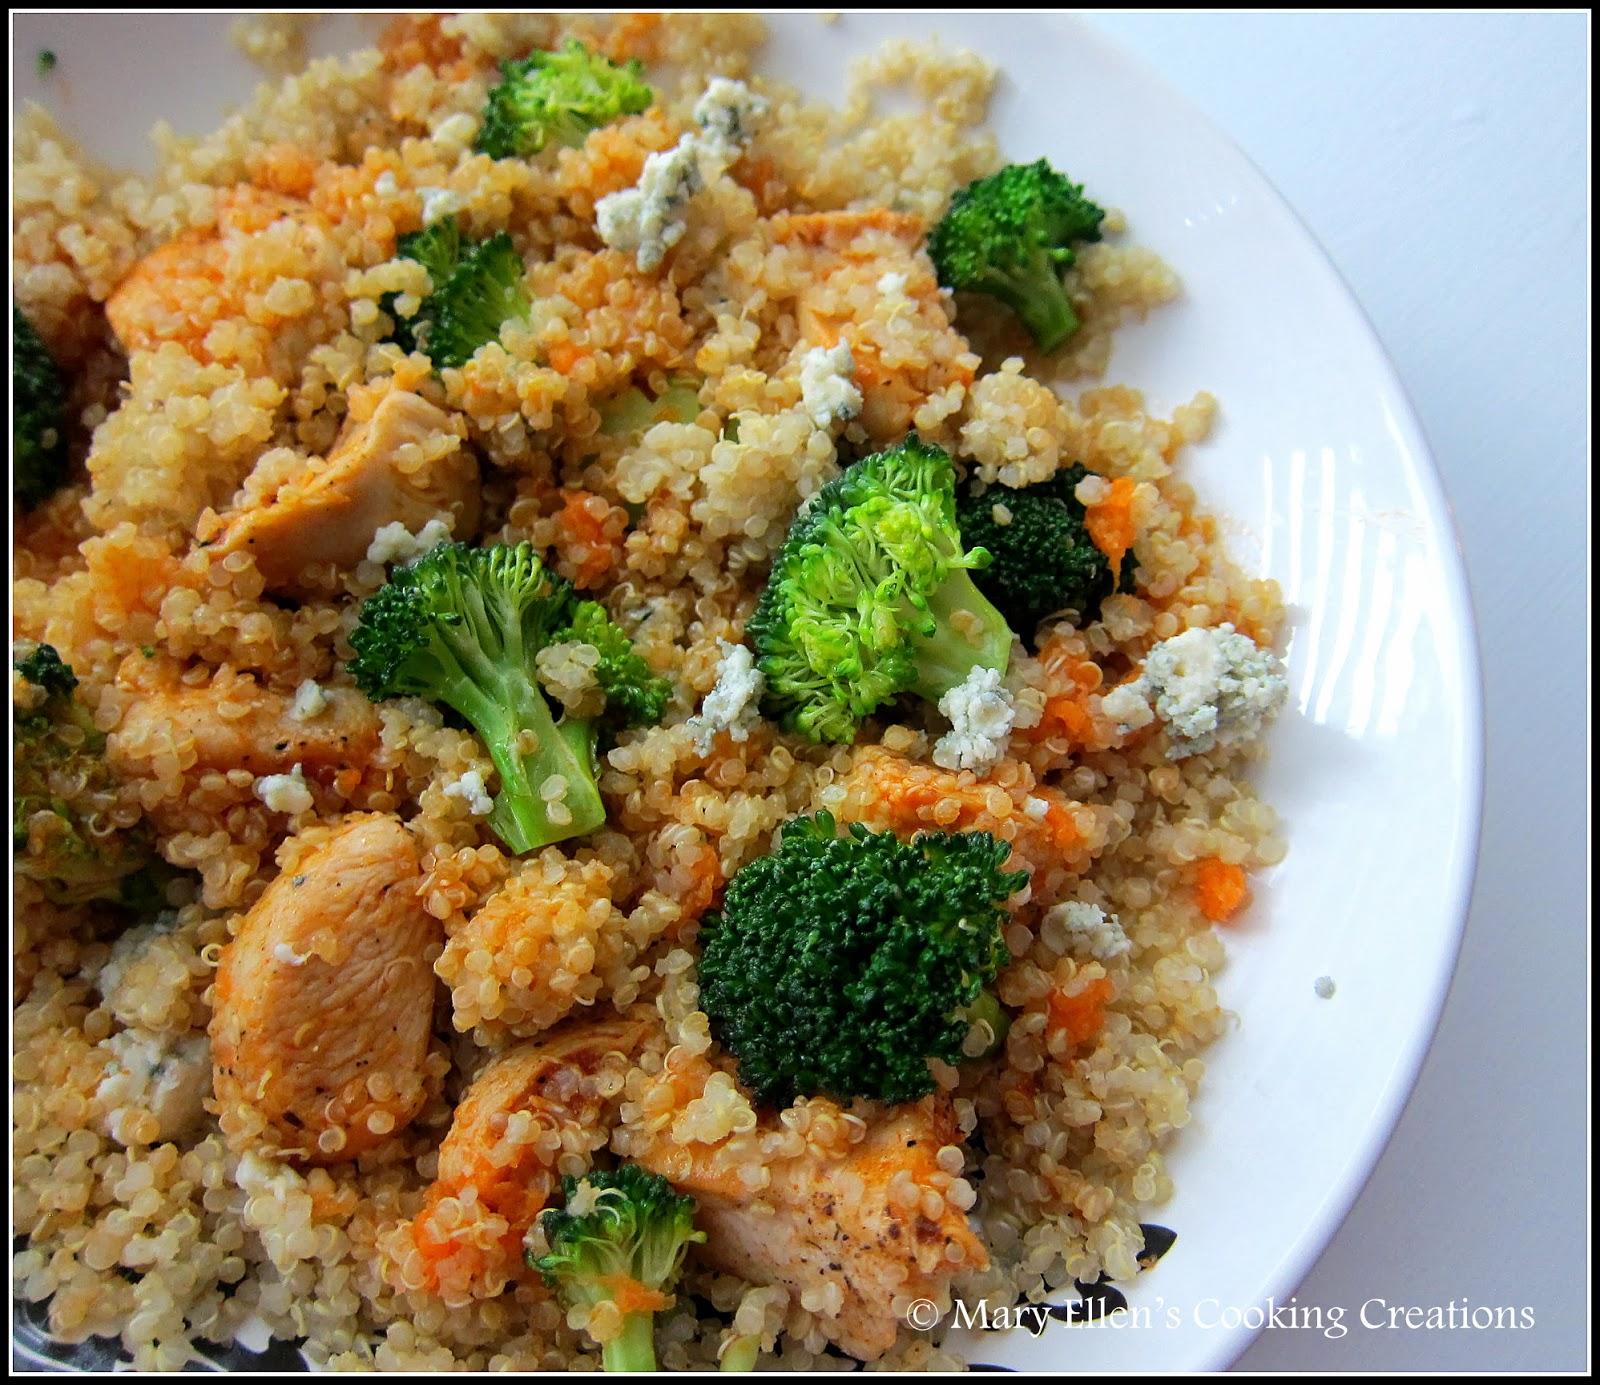 Mary Ellen's Cooking Creations: Buffalo Chicken Quinoa Salad